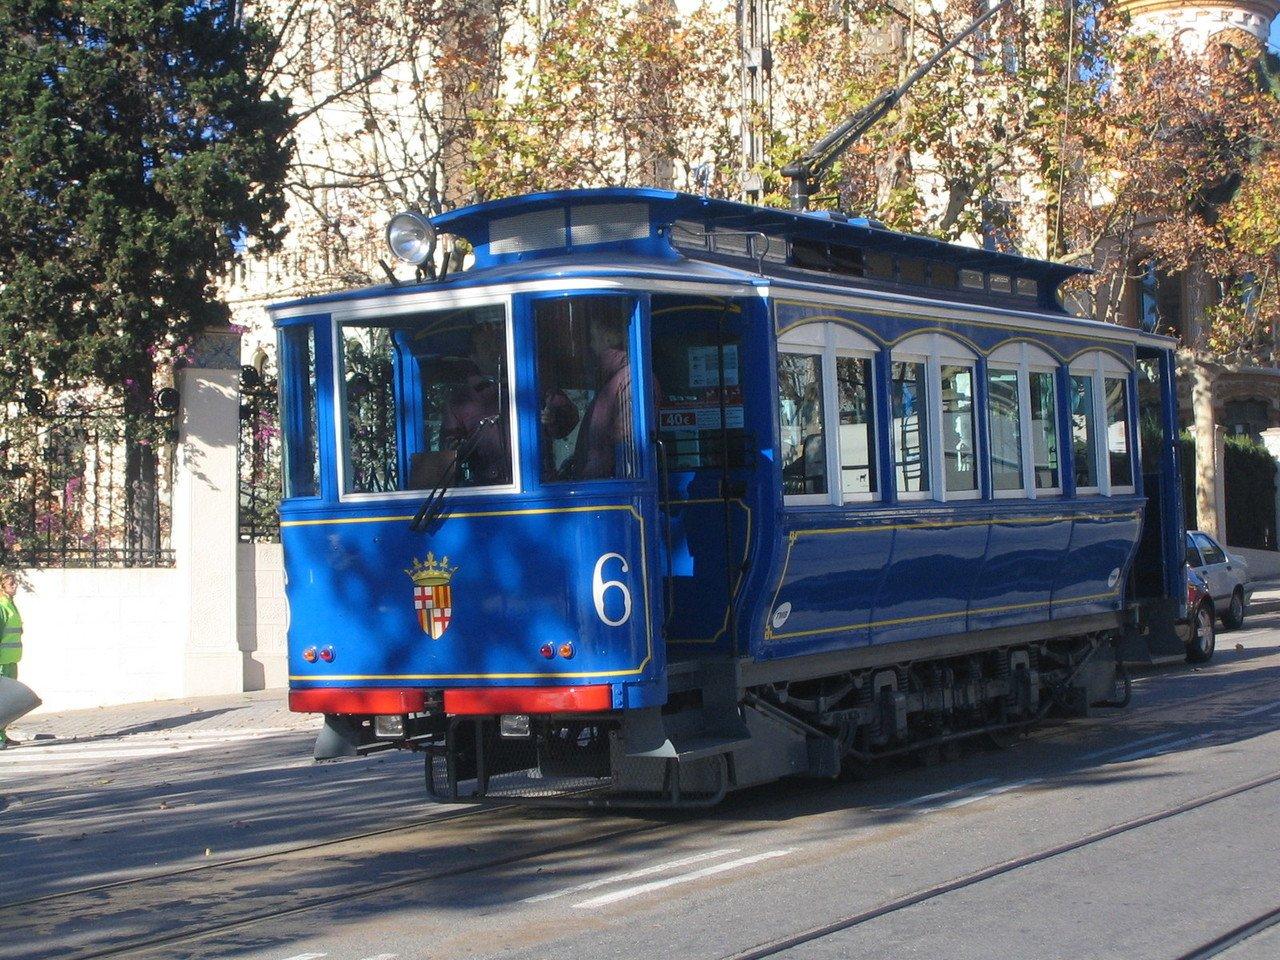 barcelona-blue-tram-1446876-1280x960